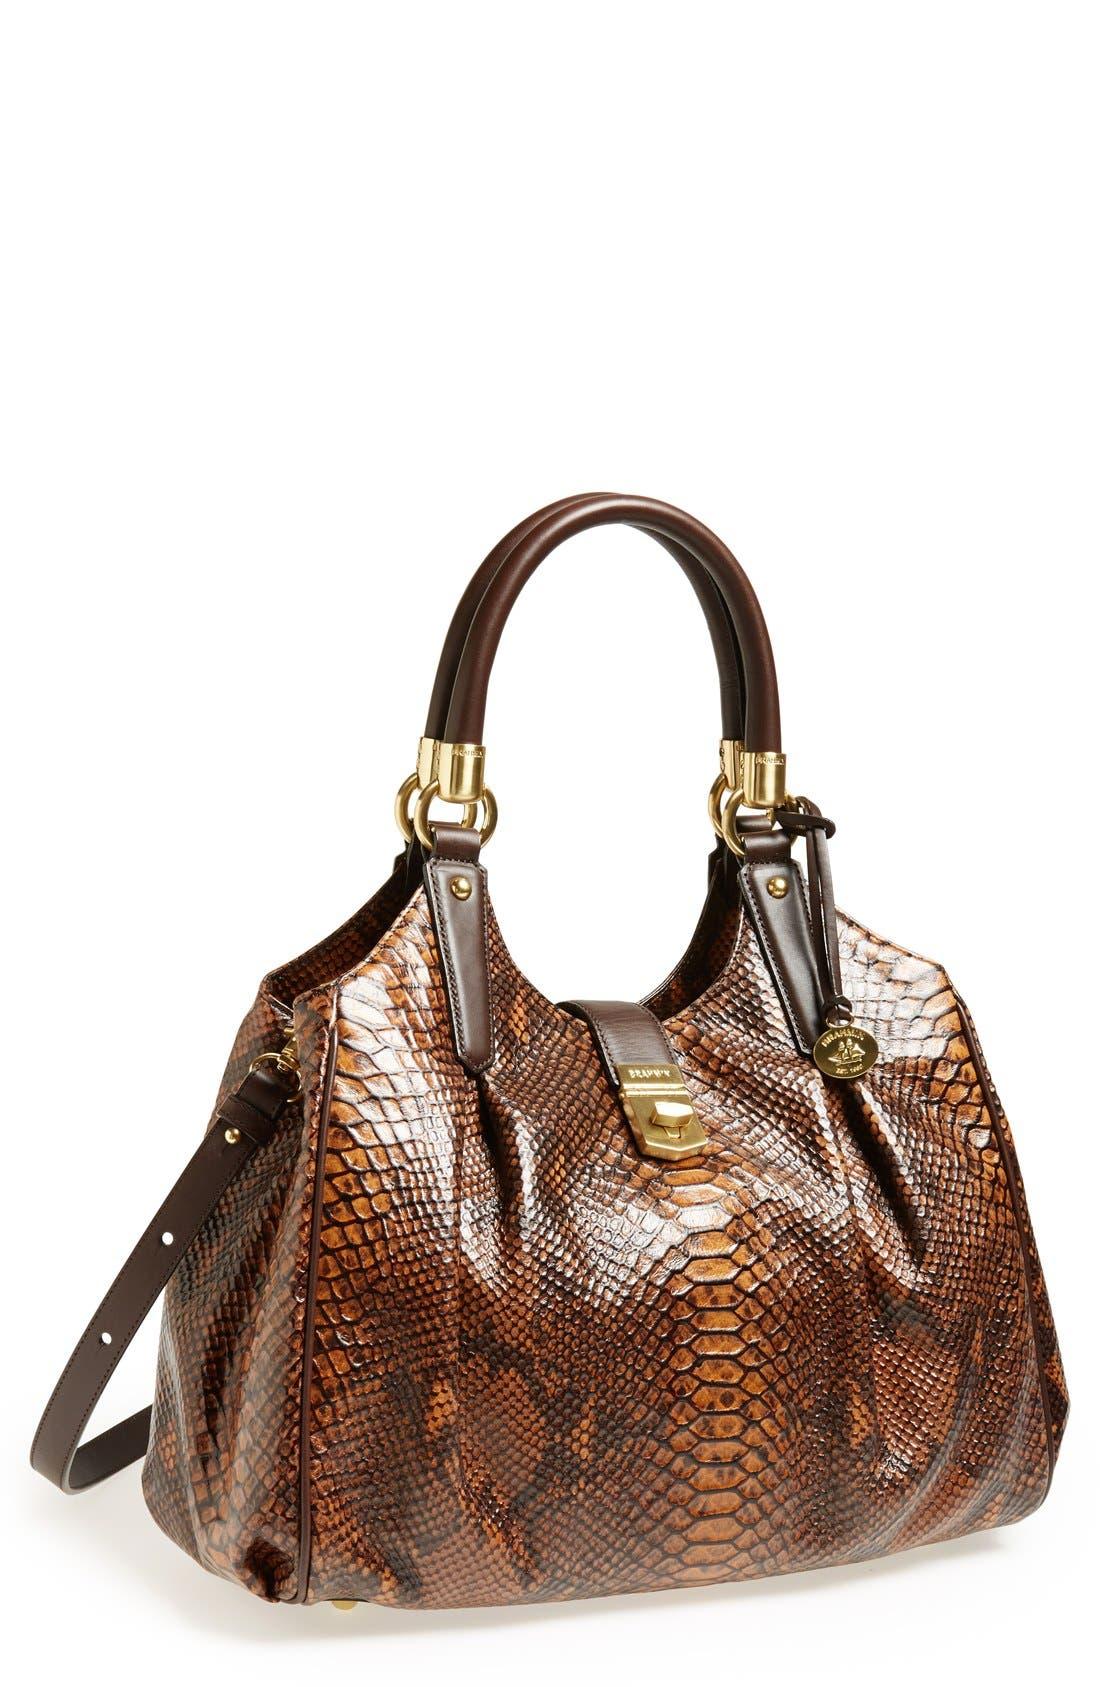 Alternate Image 1 Selected - Brahmin 'Elisa' Leather Shopper